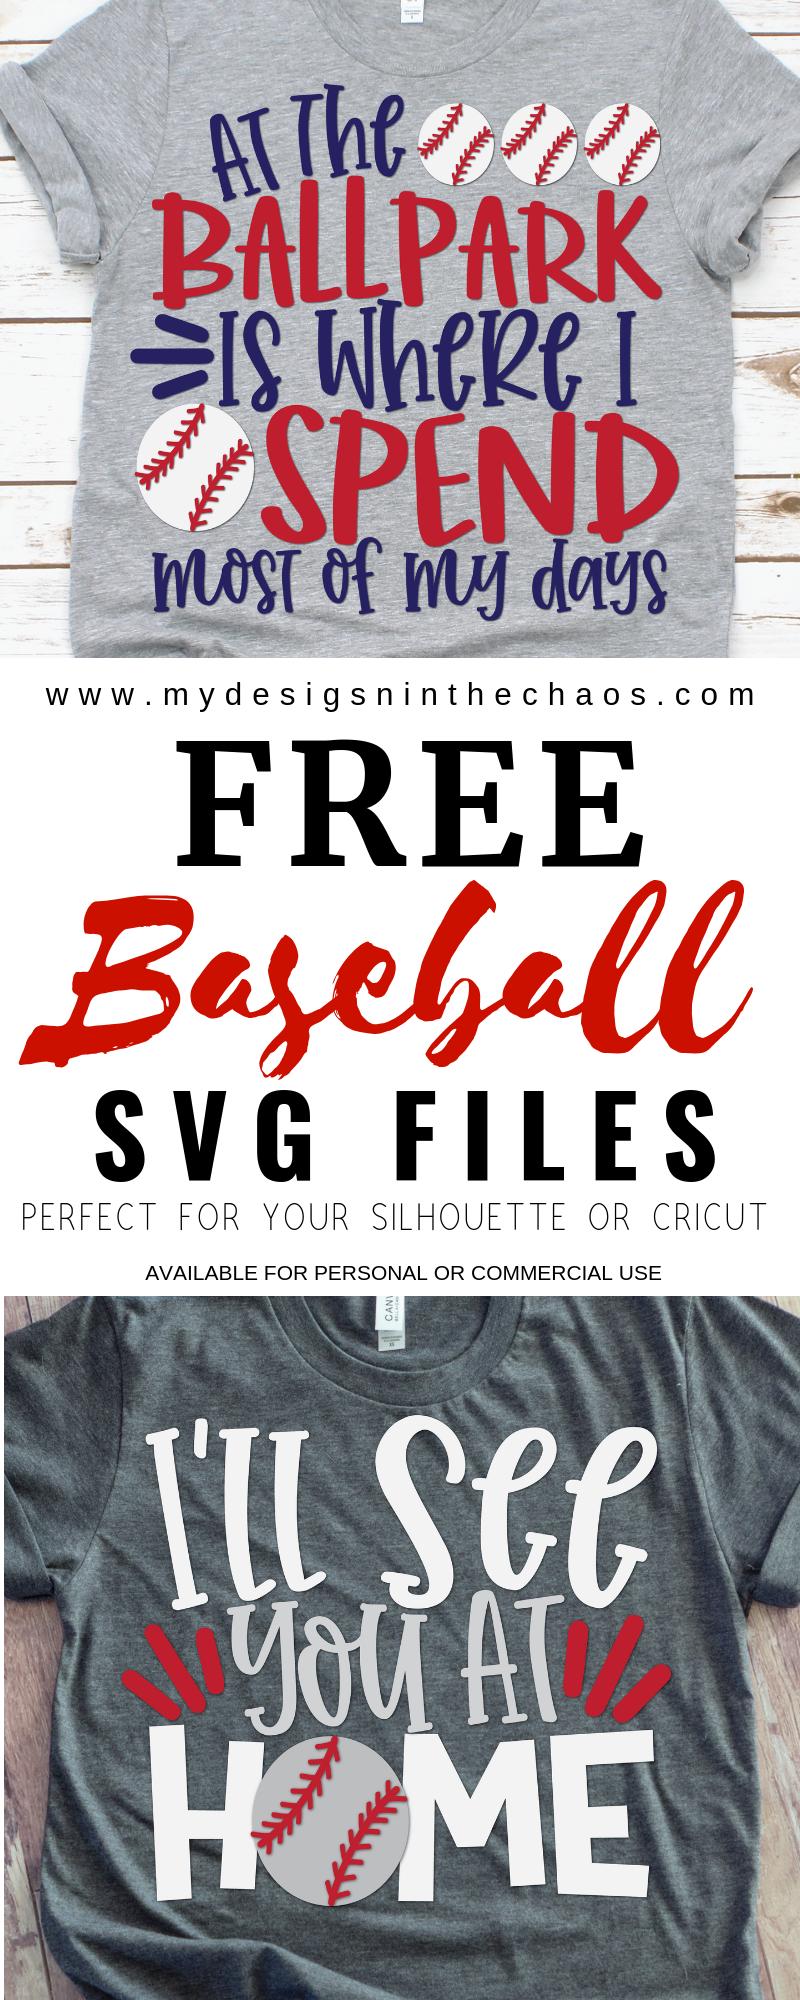 Free Baseball Svg Files For Silhouette Or Cricut My Designs In The Chaos Baseball Svg Cricut Baseball